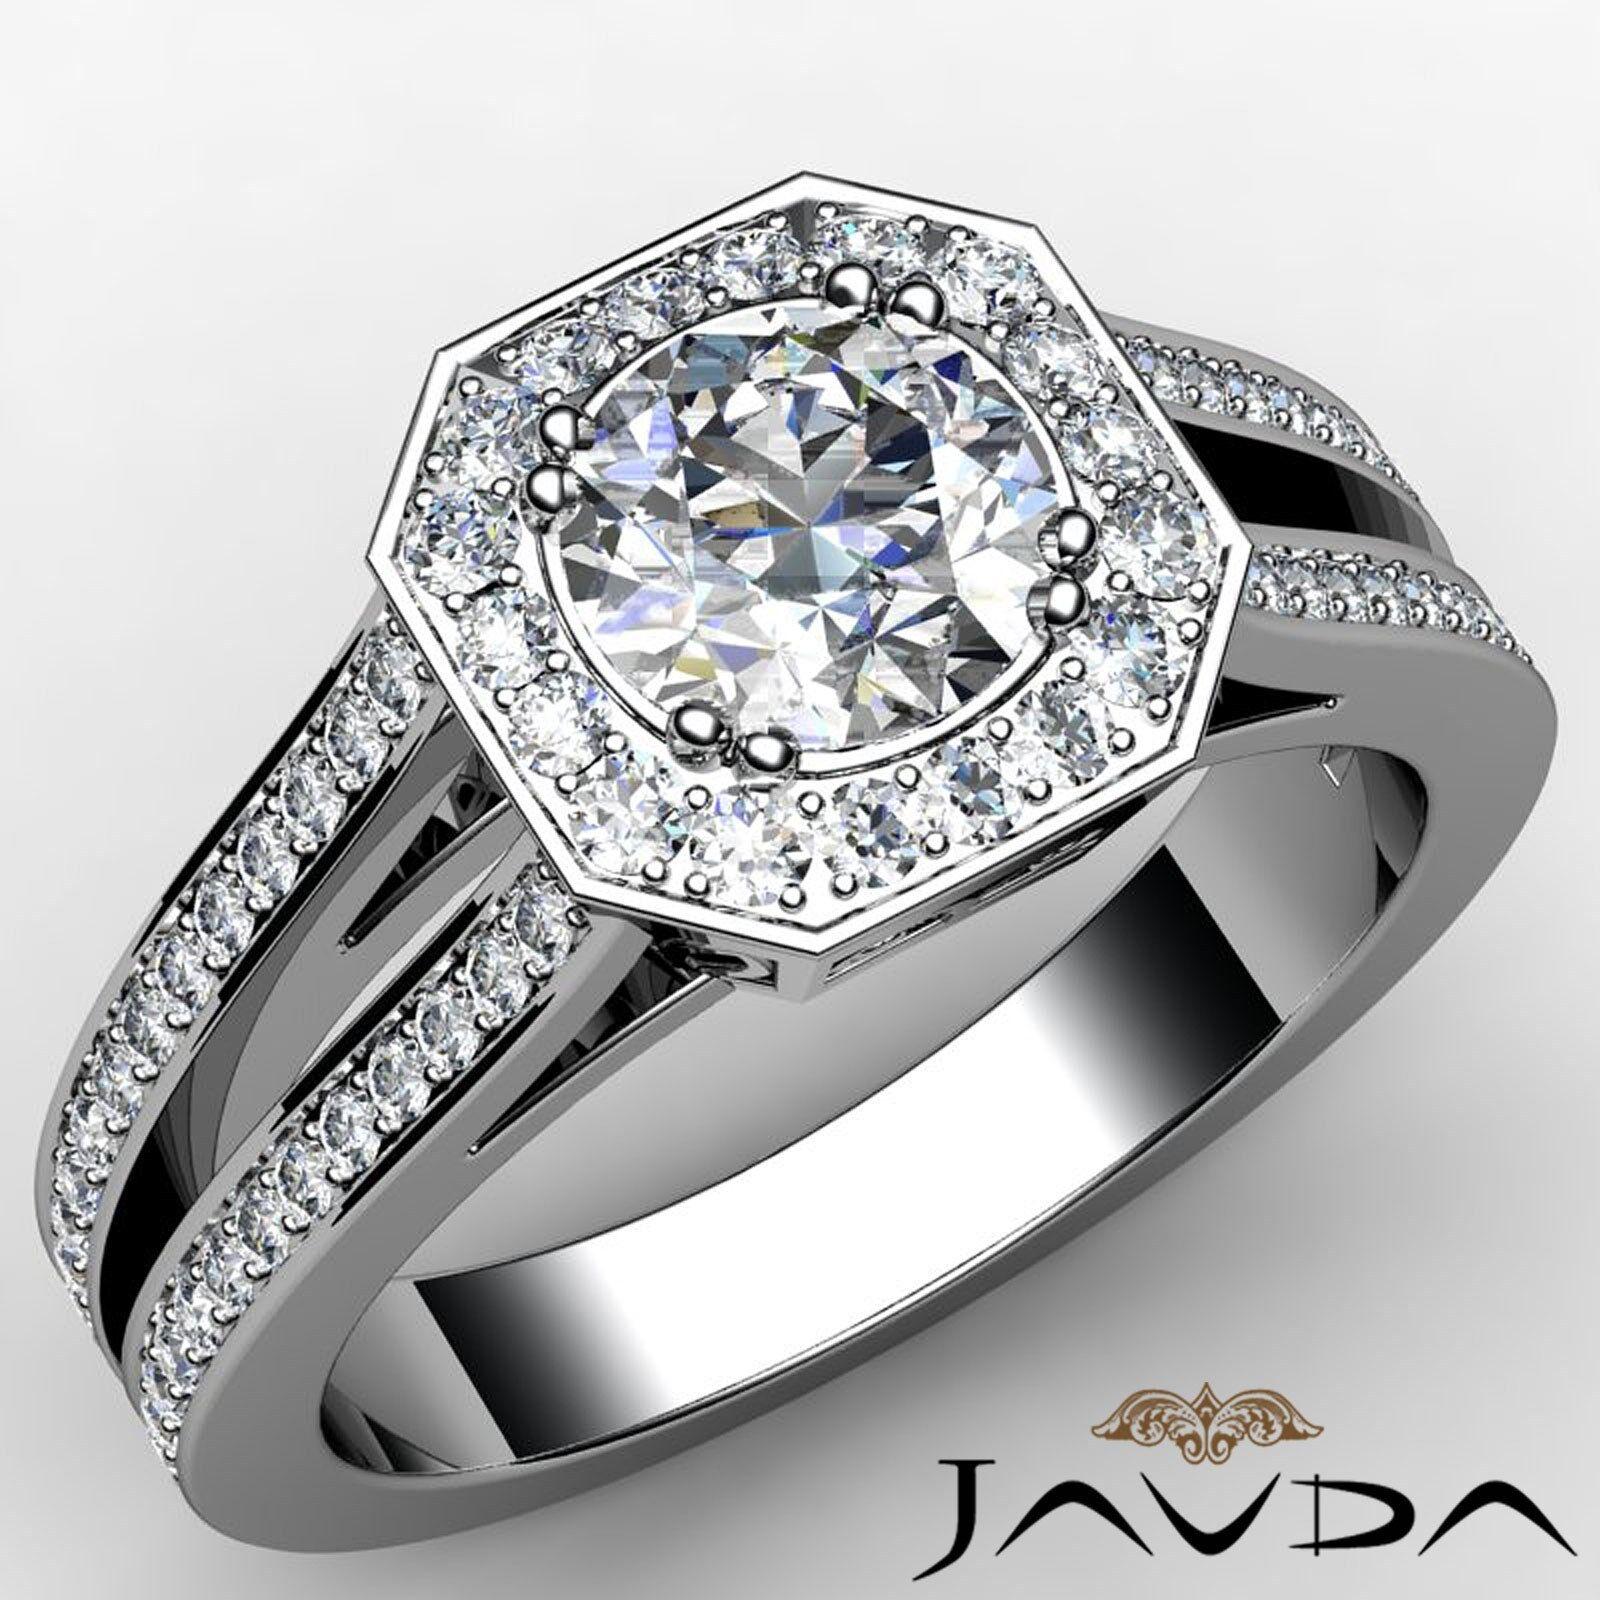 Halo Split Shank Pave Set Round Diamond Engagement Ring GIA I Color VS2 2.46Ct